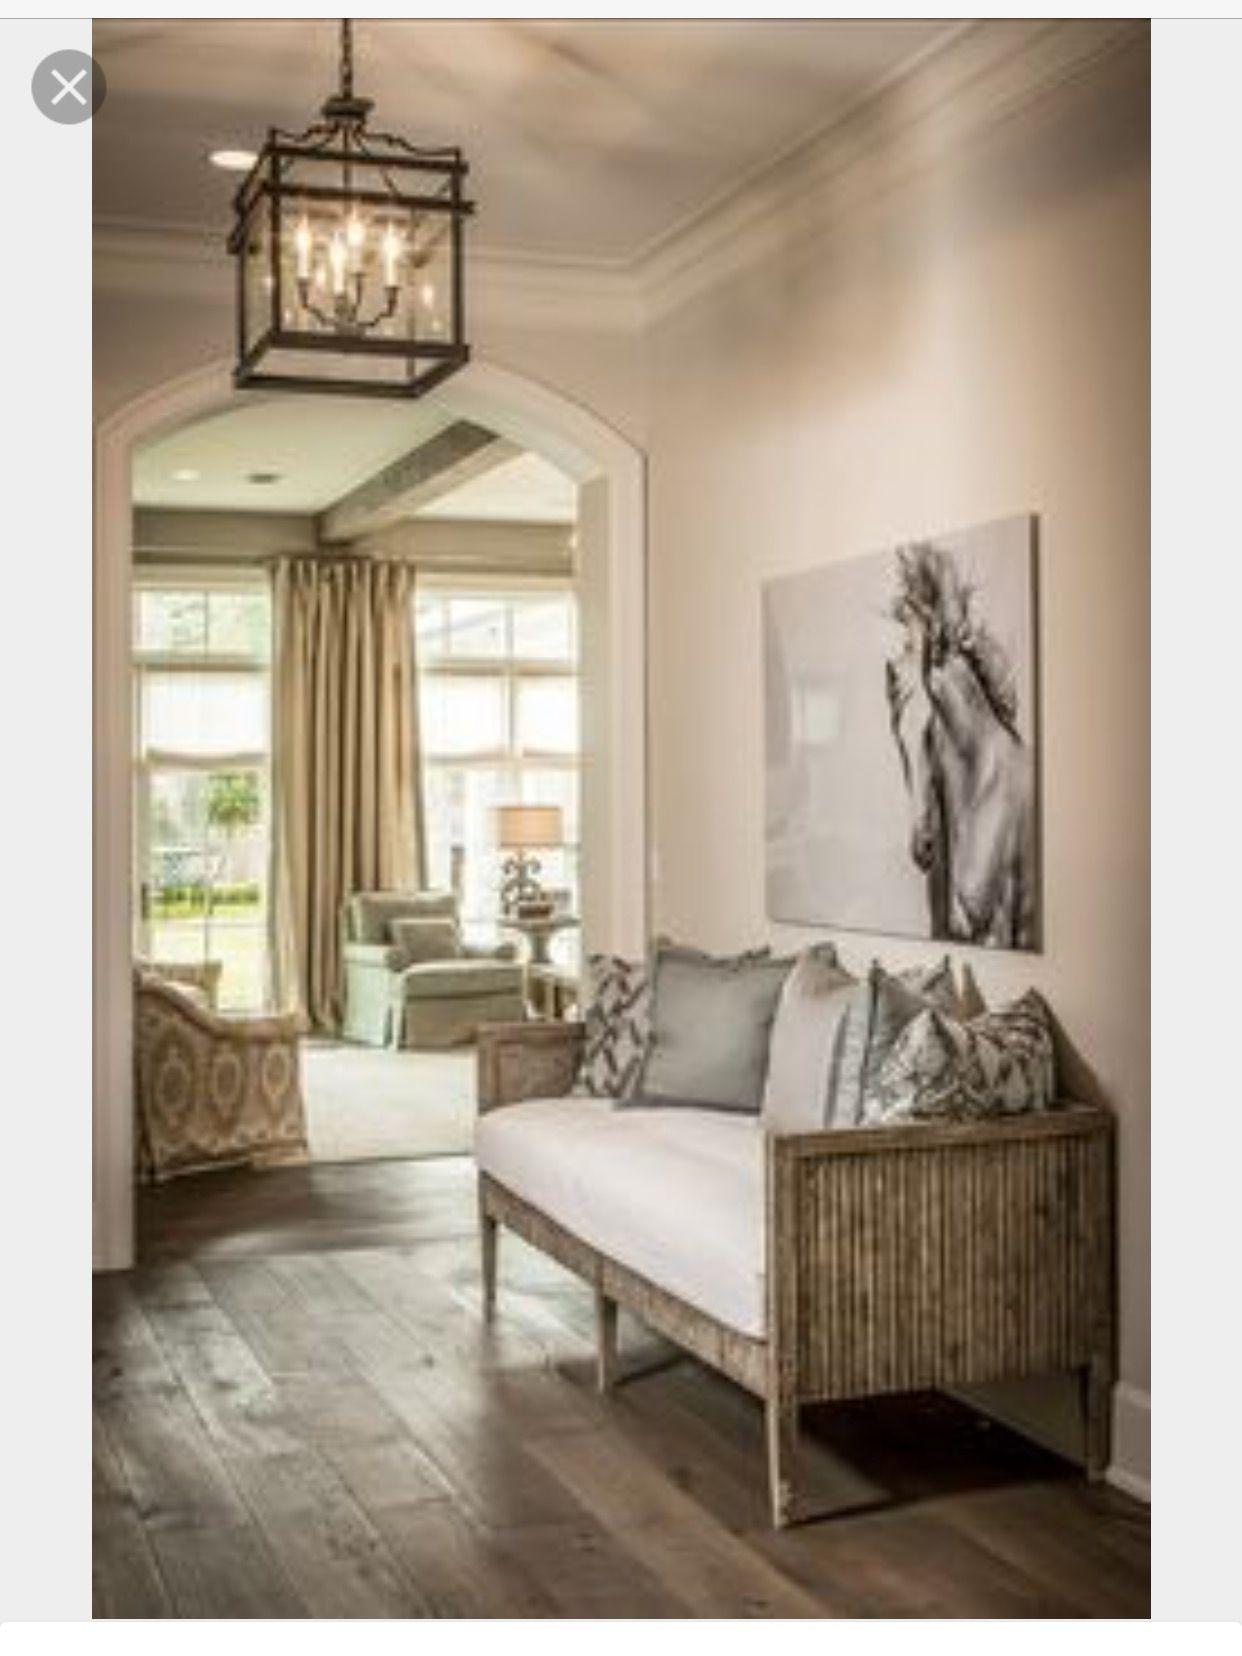 Pin by angela novielli on home decor pinterest house